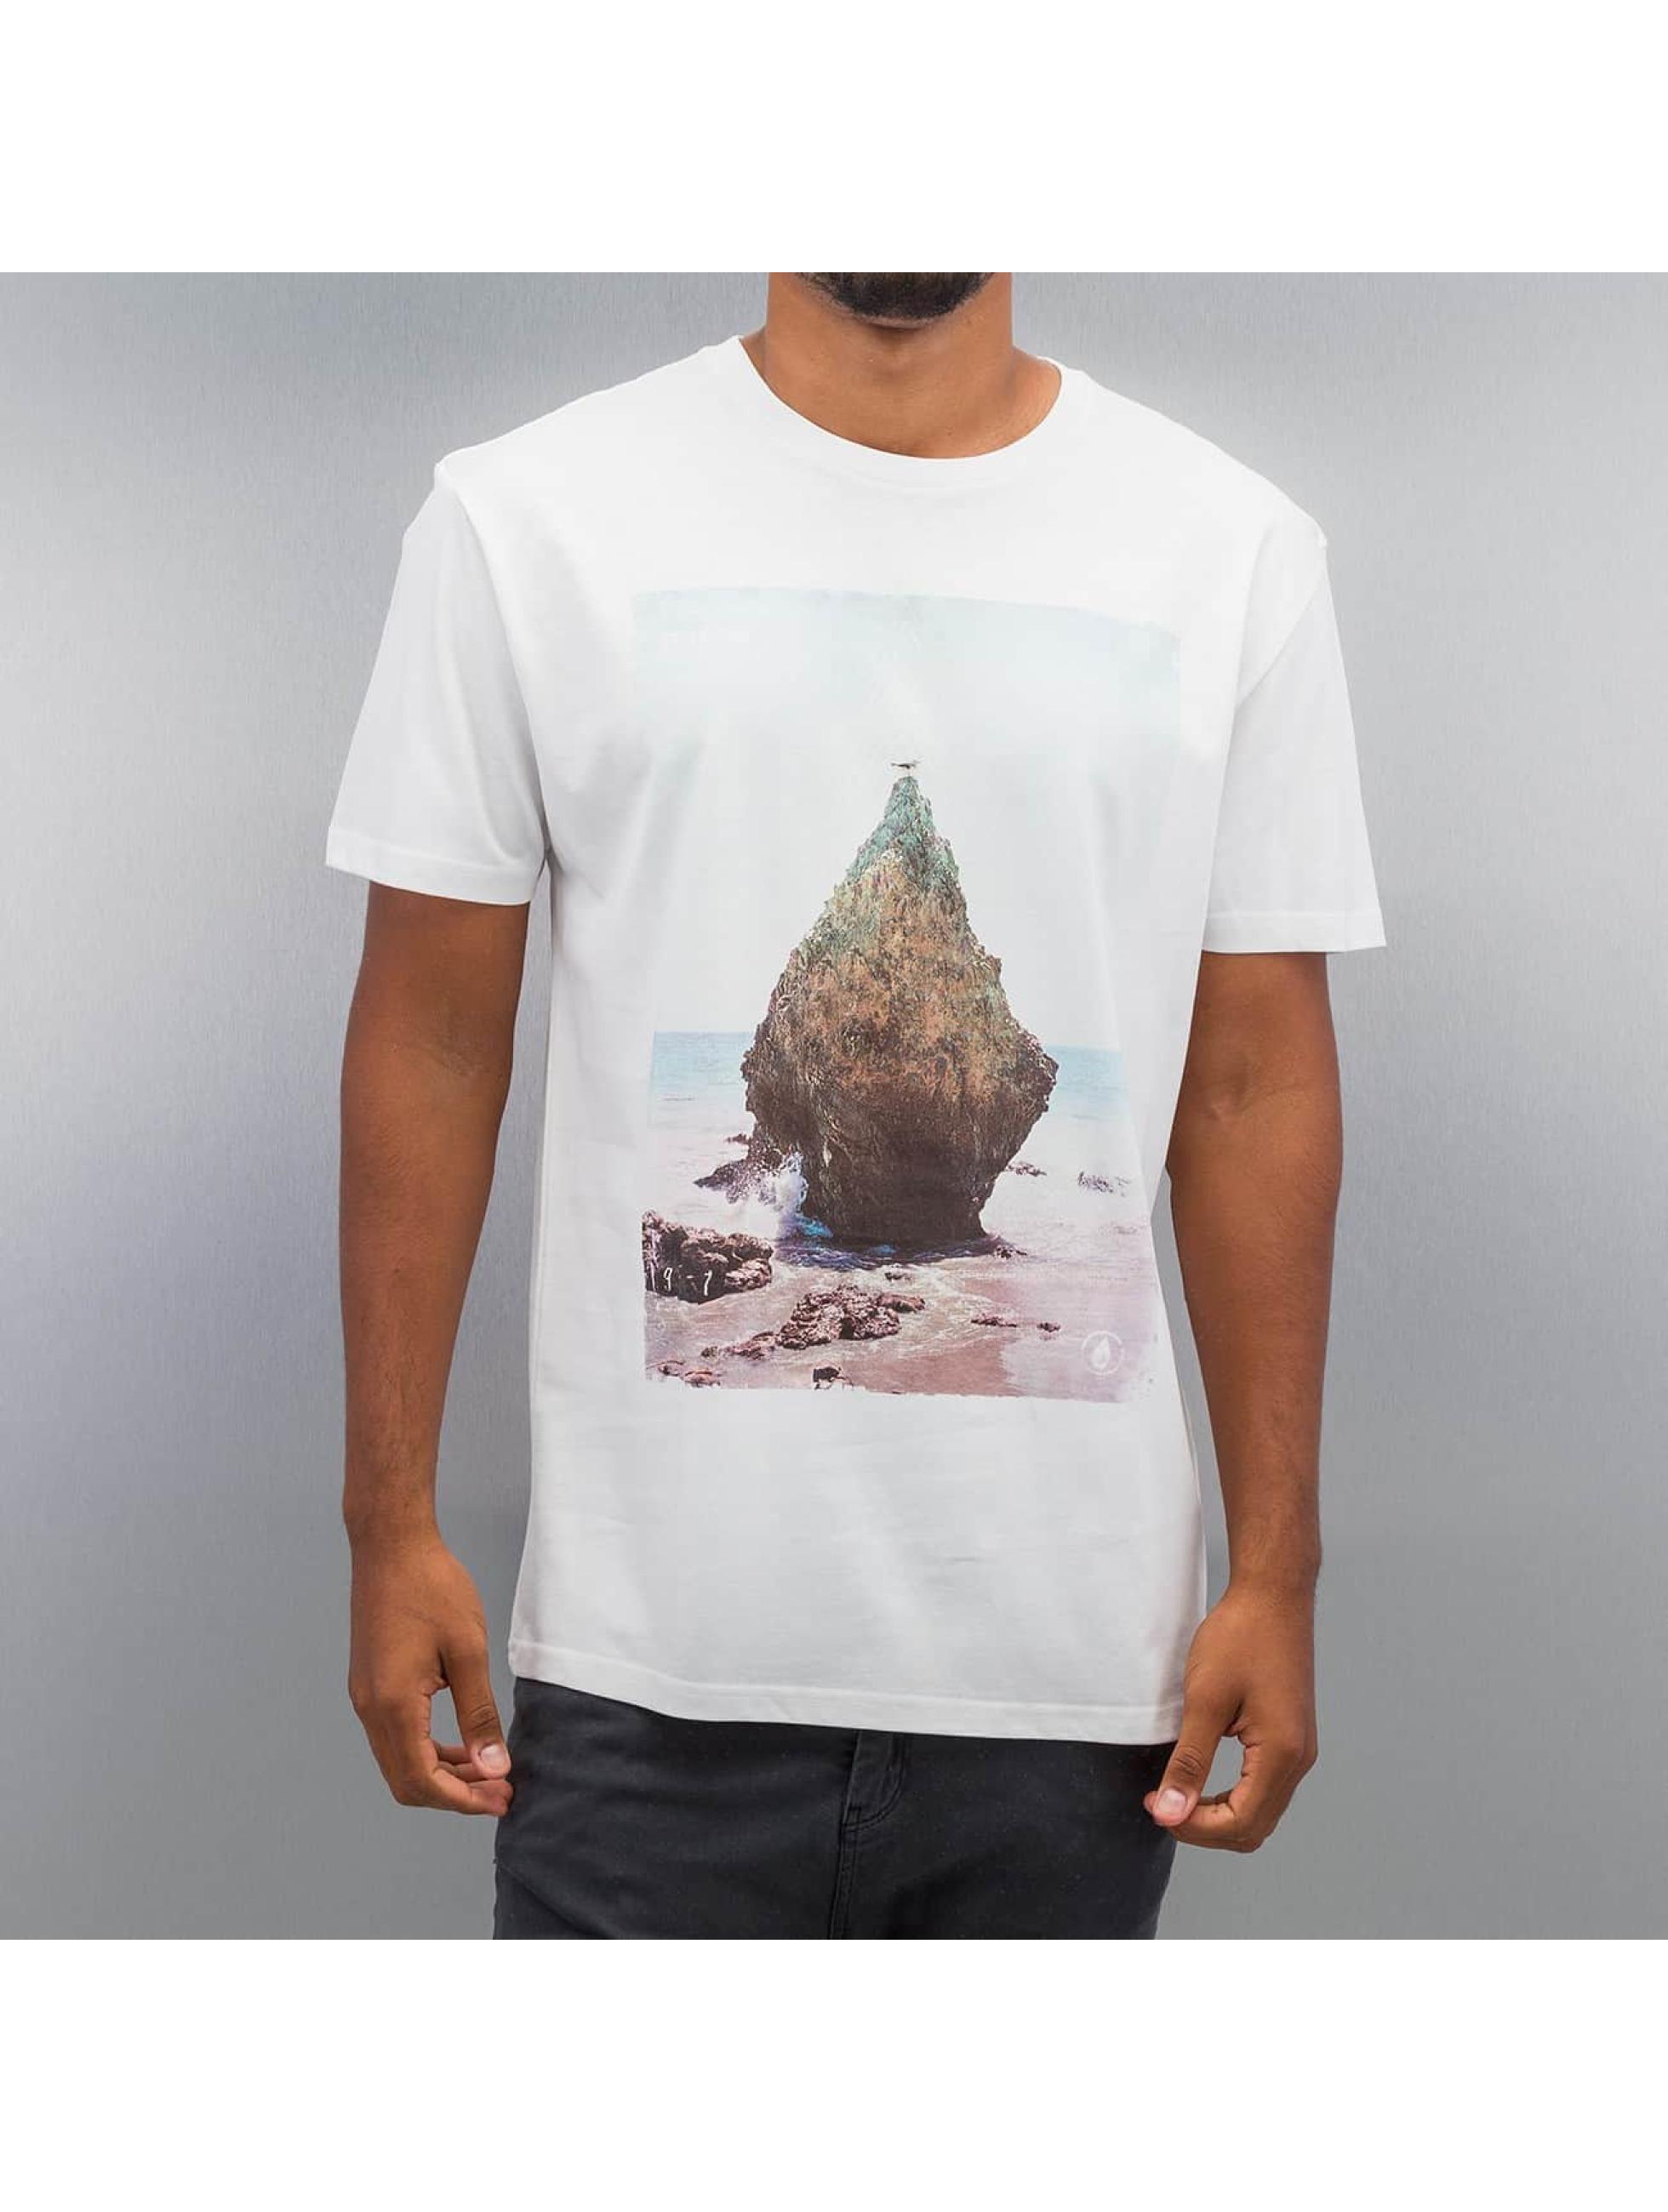 Volcom t-shirt Stoned wit